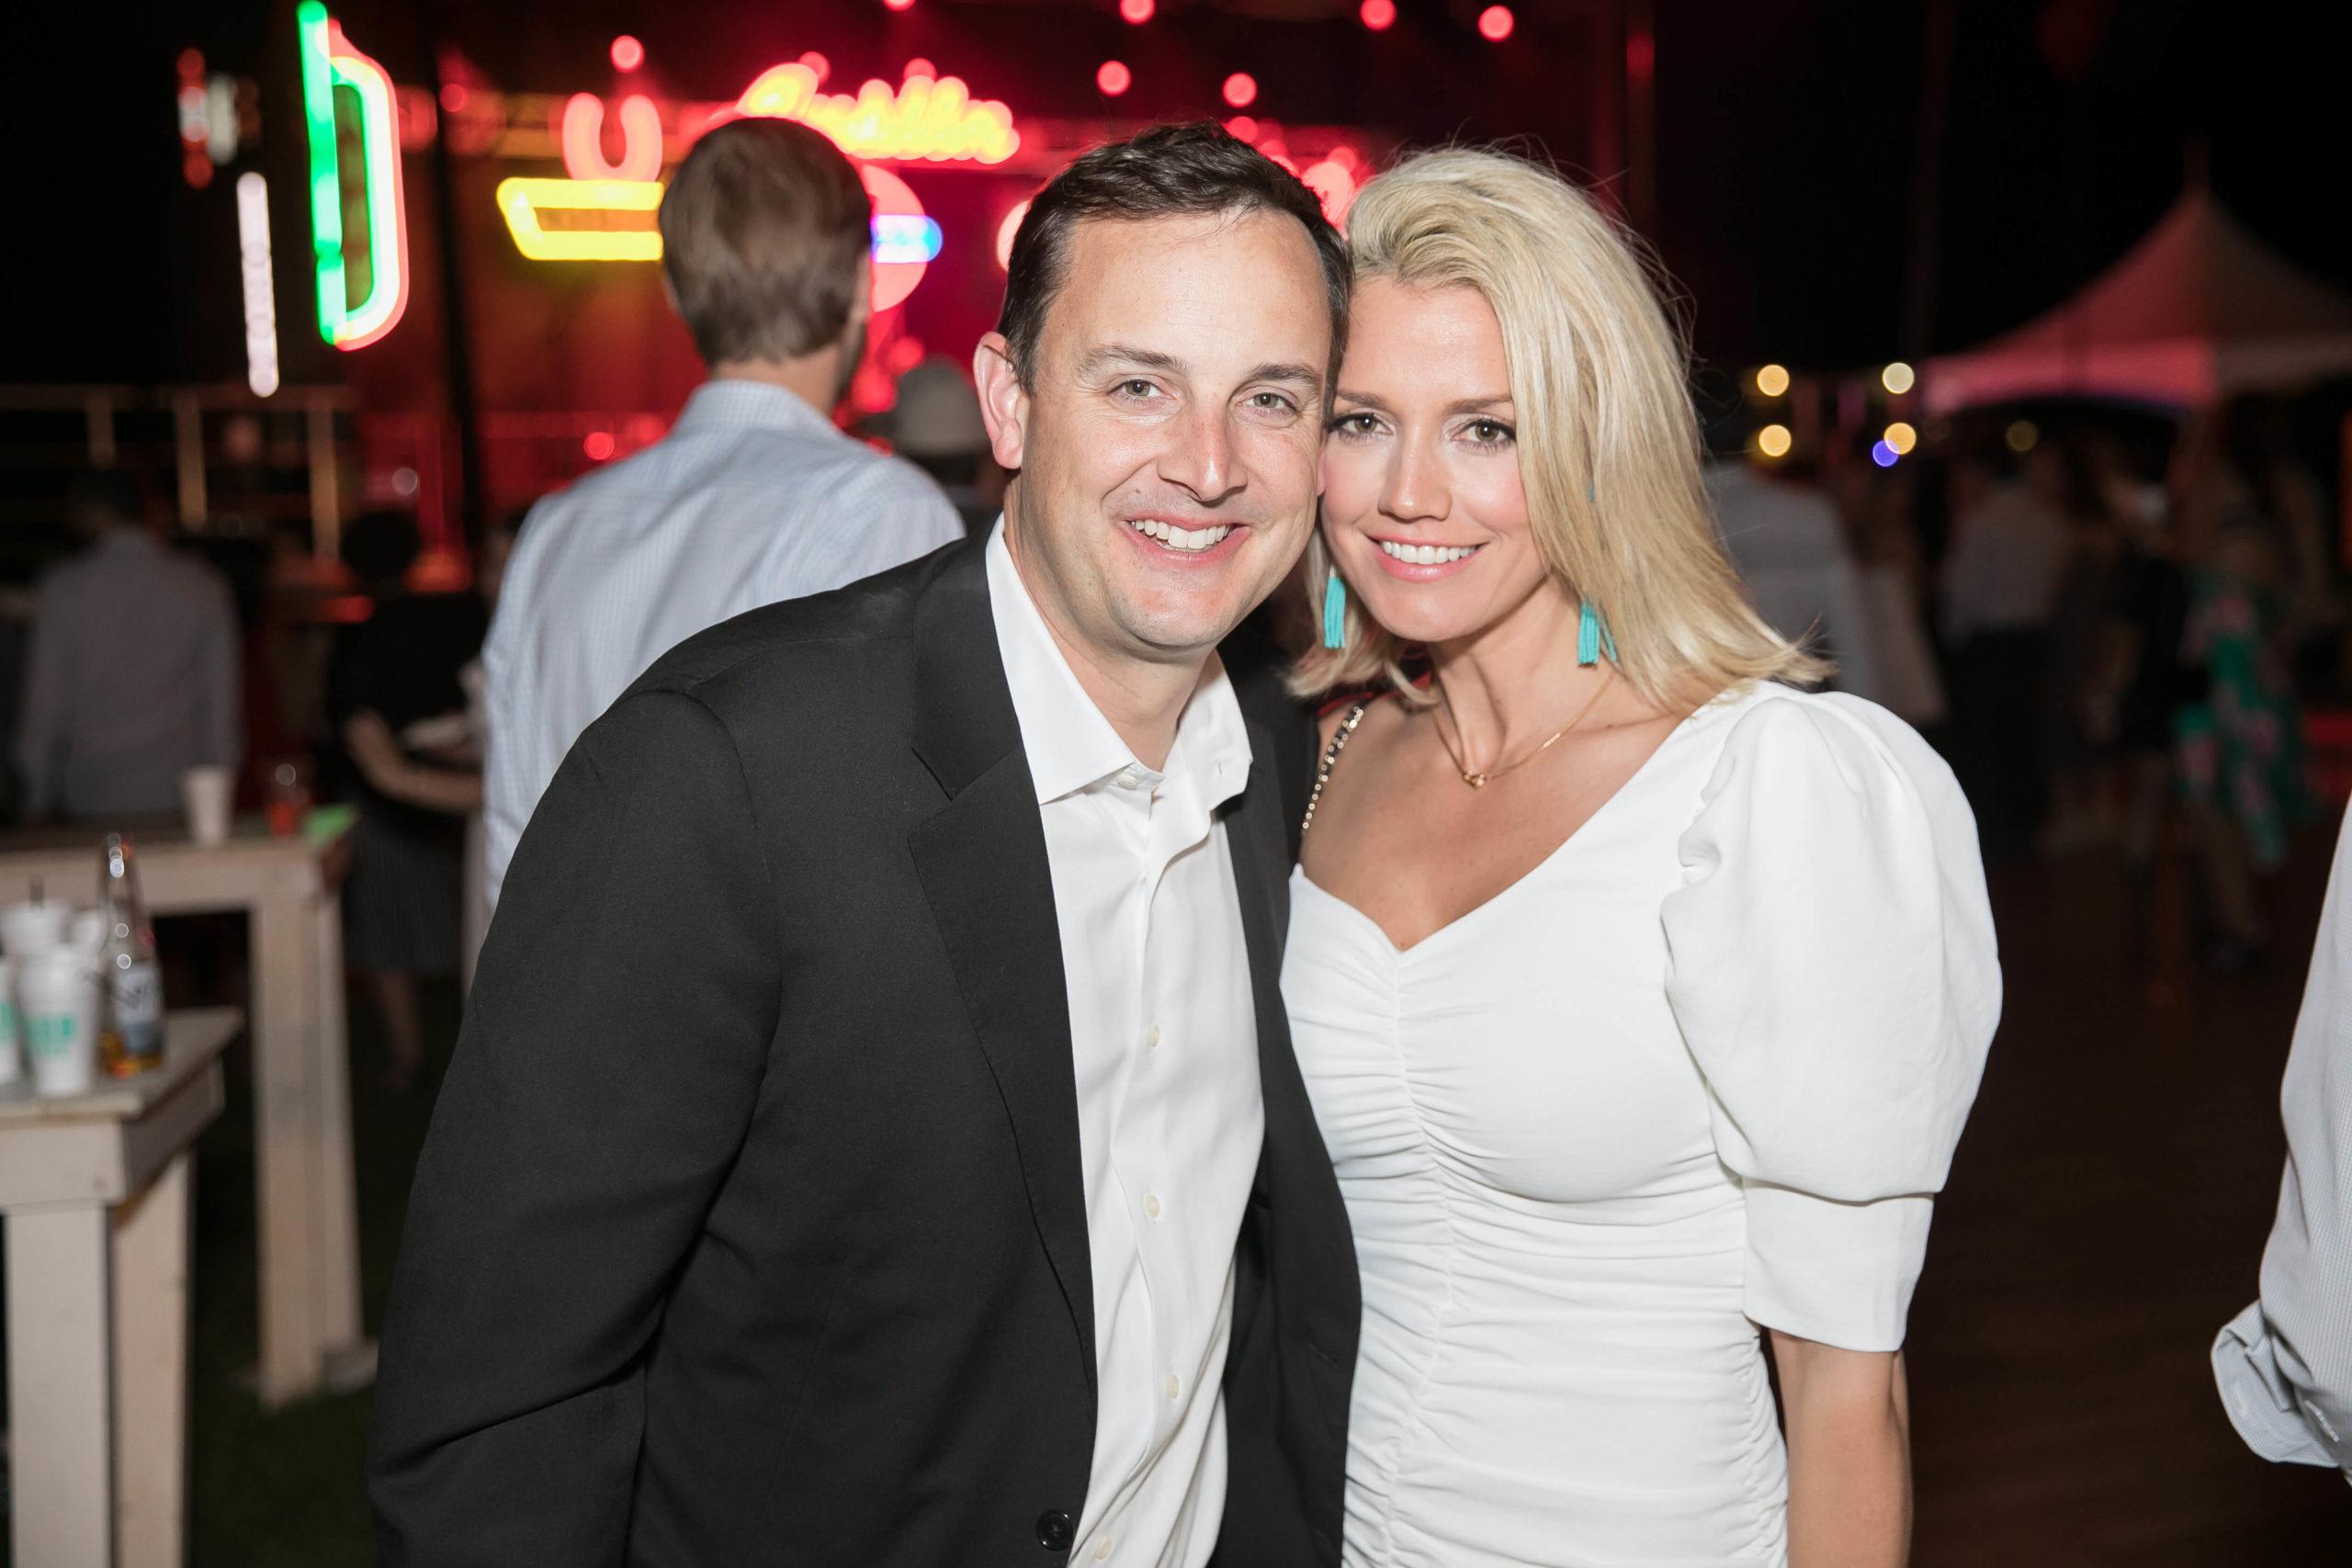 J.R. and Jill Kraft - SILHOUETTE